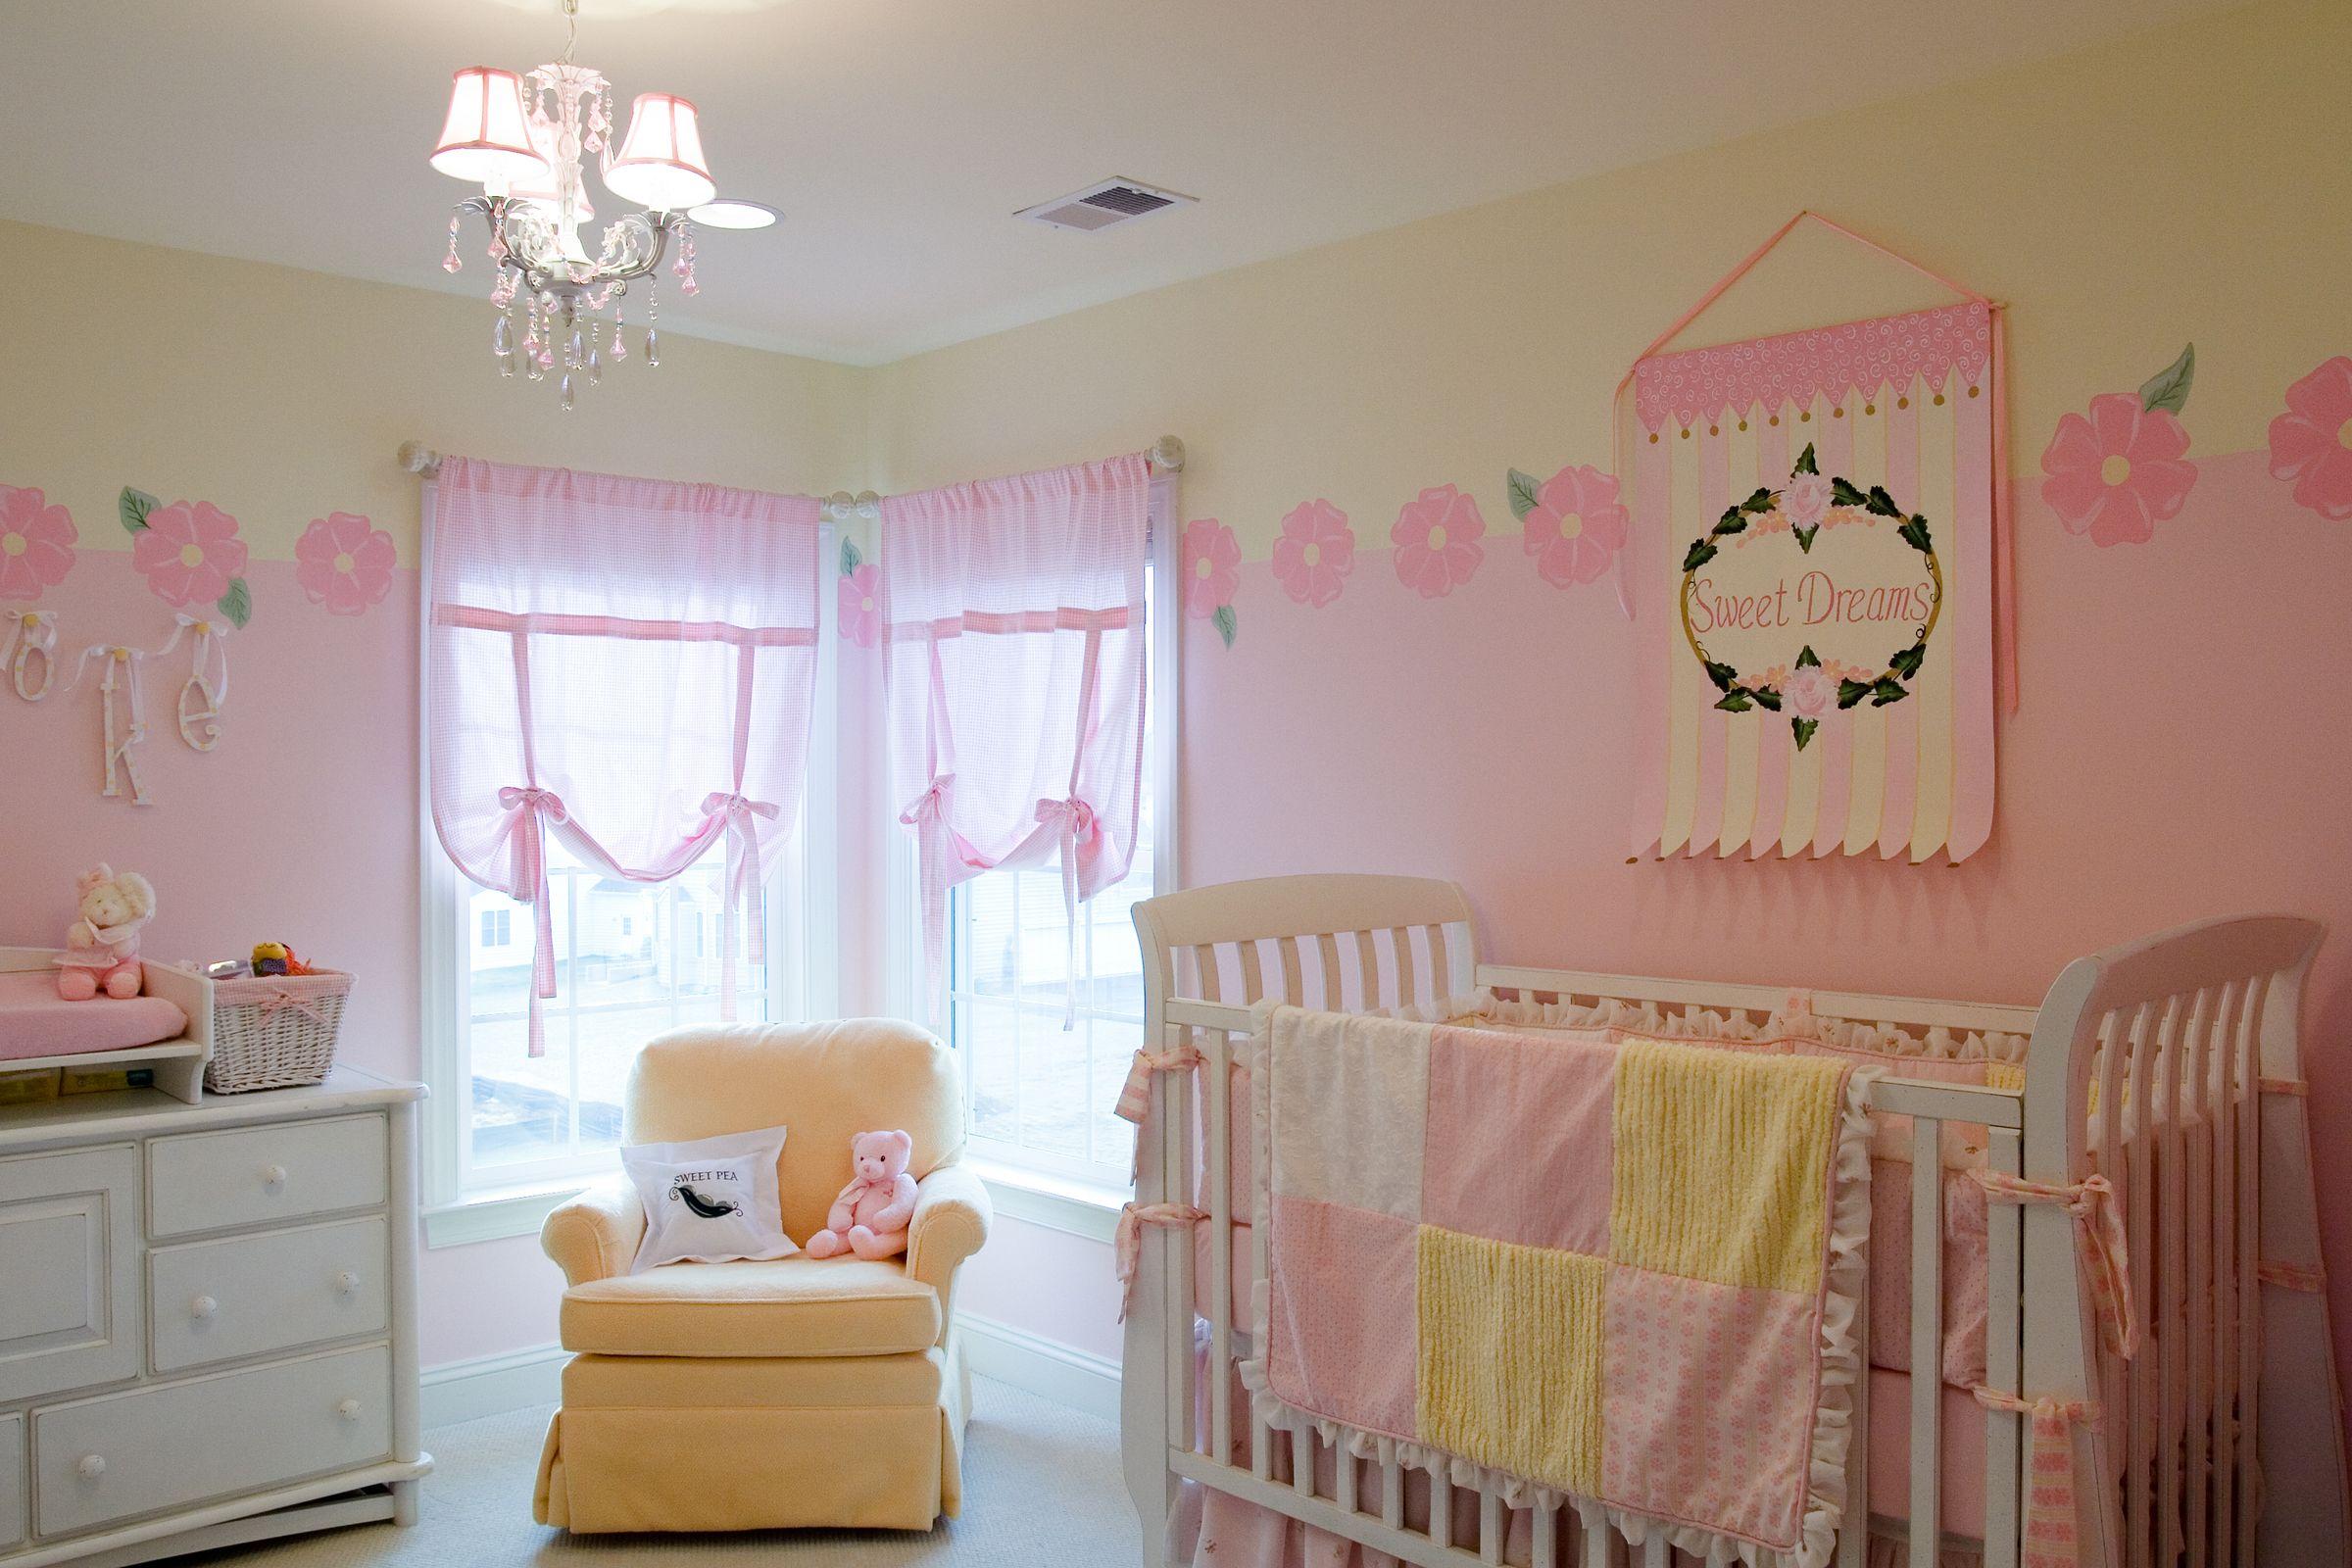 Baby Nursery Ideas Baby and Kids Designer Rooms Design Ideas